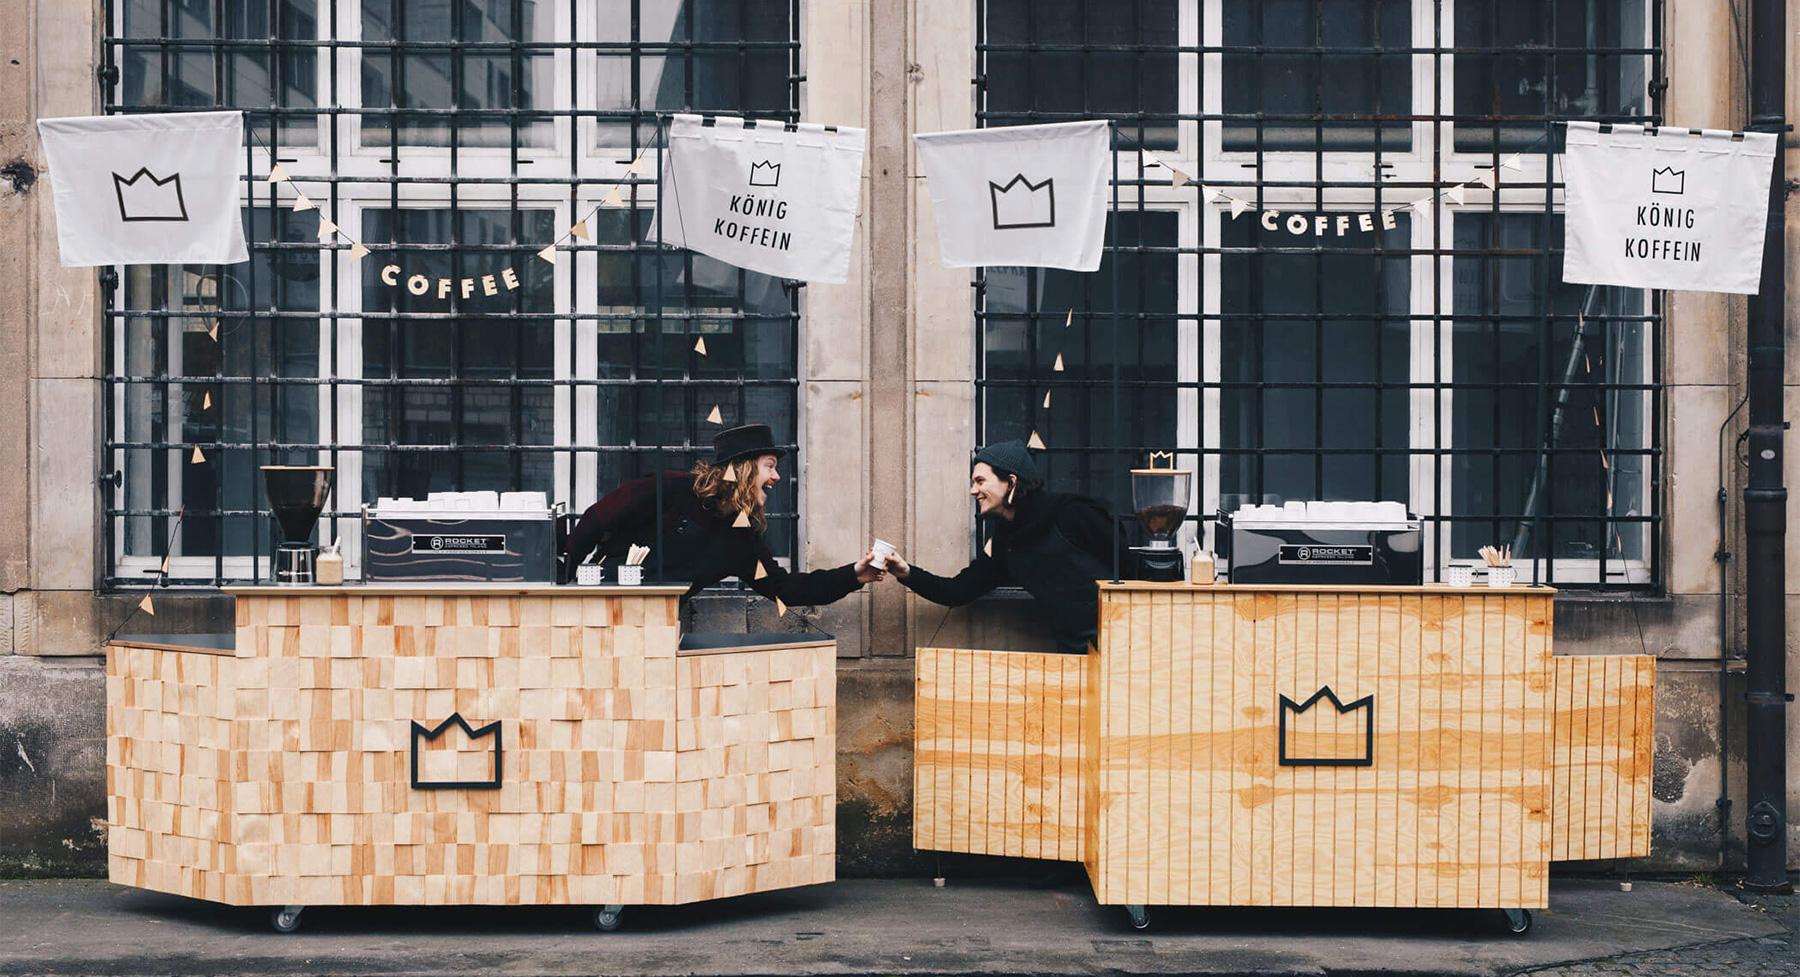 koenig_koffein_kaffee_catering_mobile_bars_header-gr